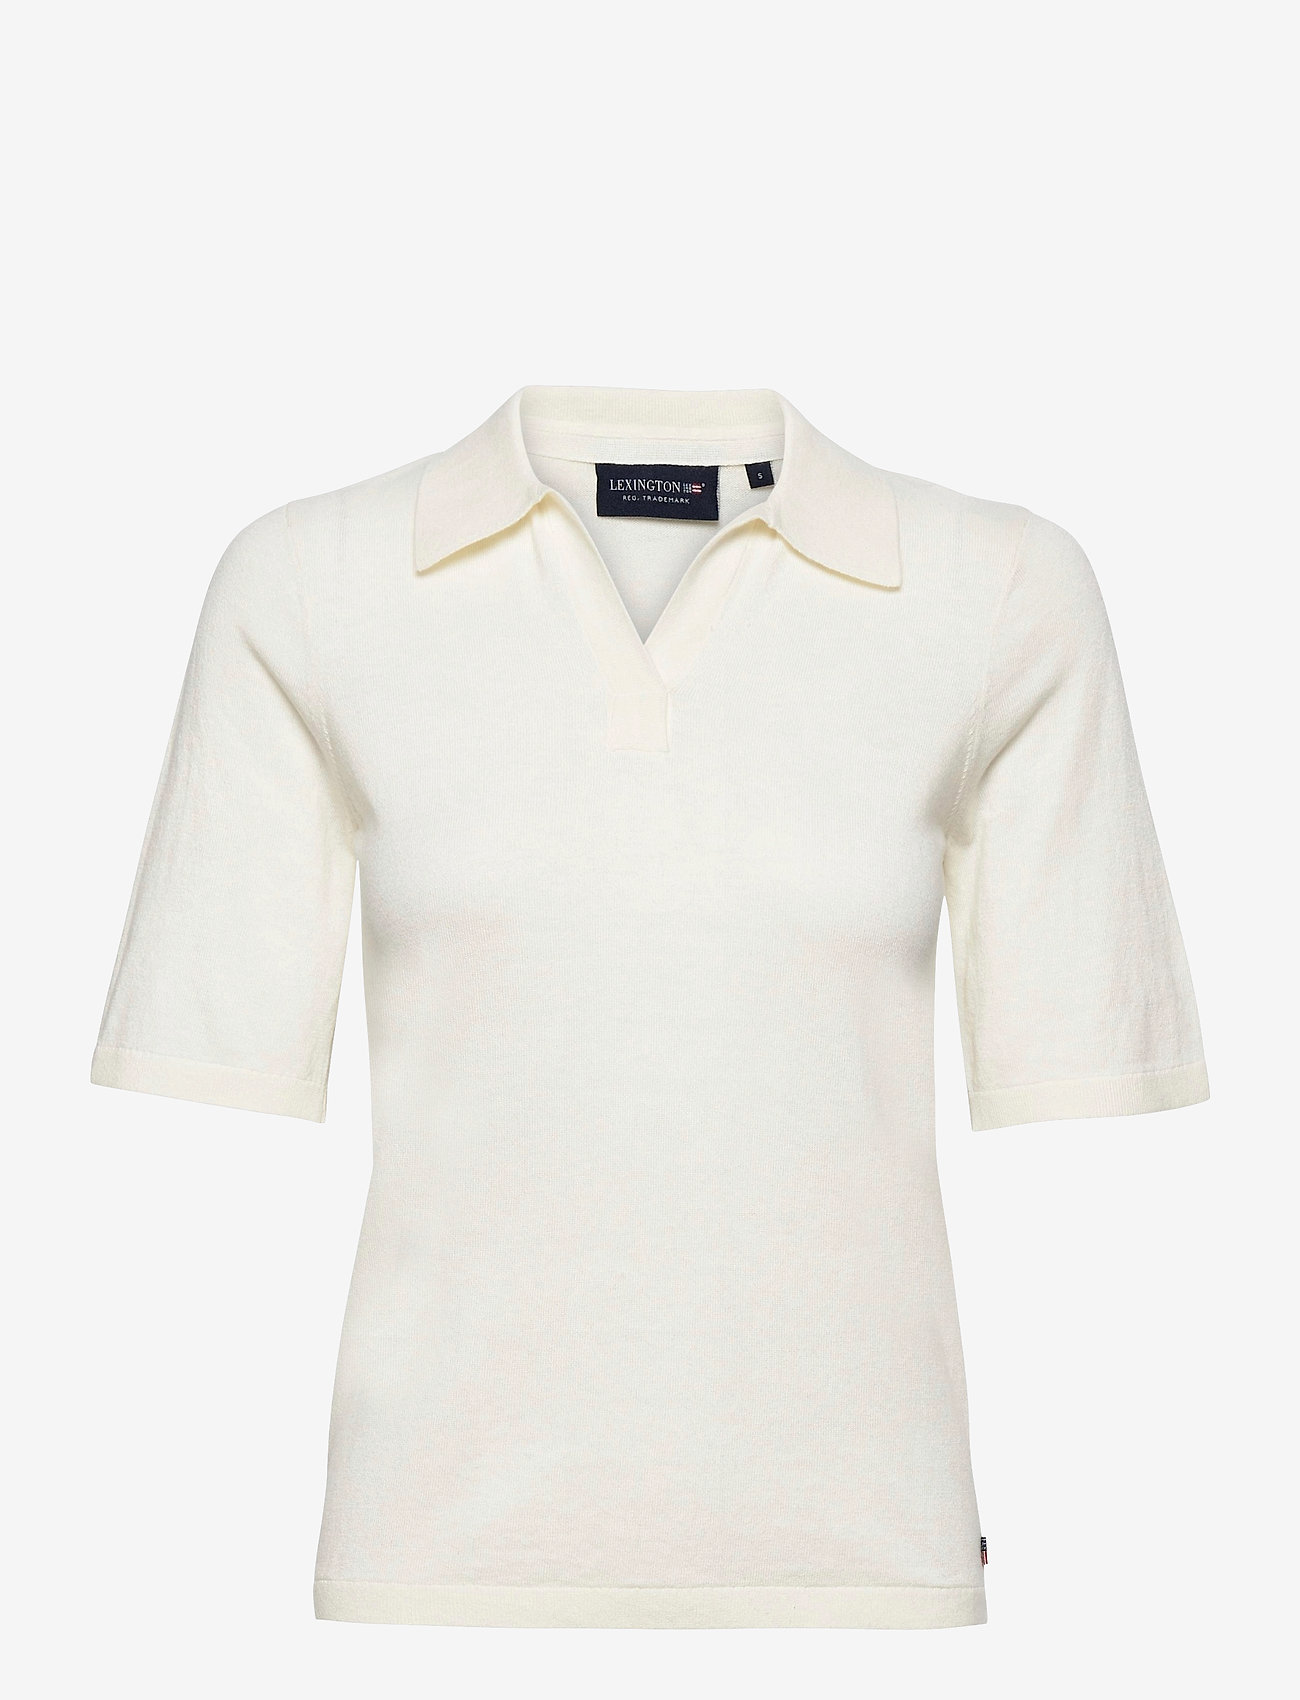 Lexington Clothing - Amilia Cotton/Silk Blend Short Sleeve Knitted Polo - polohemden - offwhite - 1